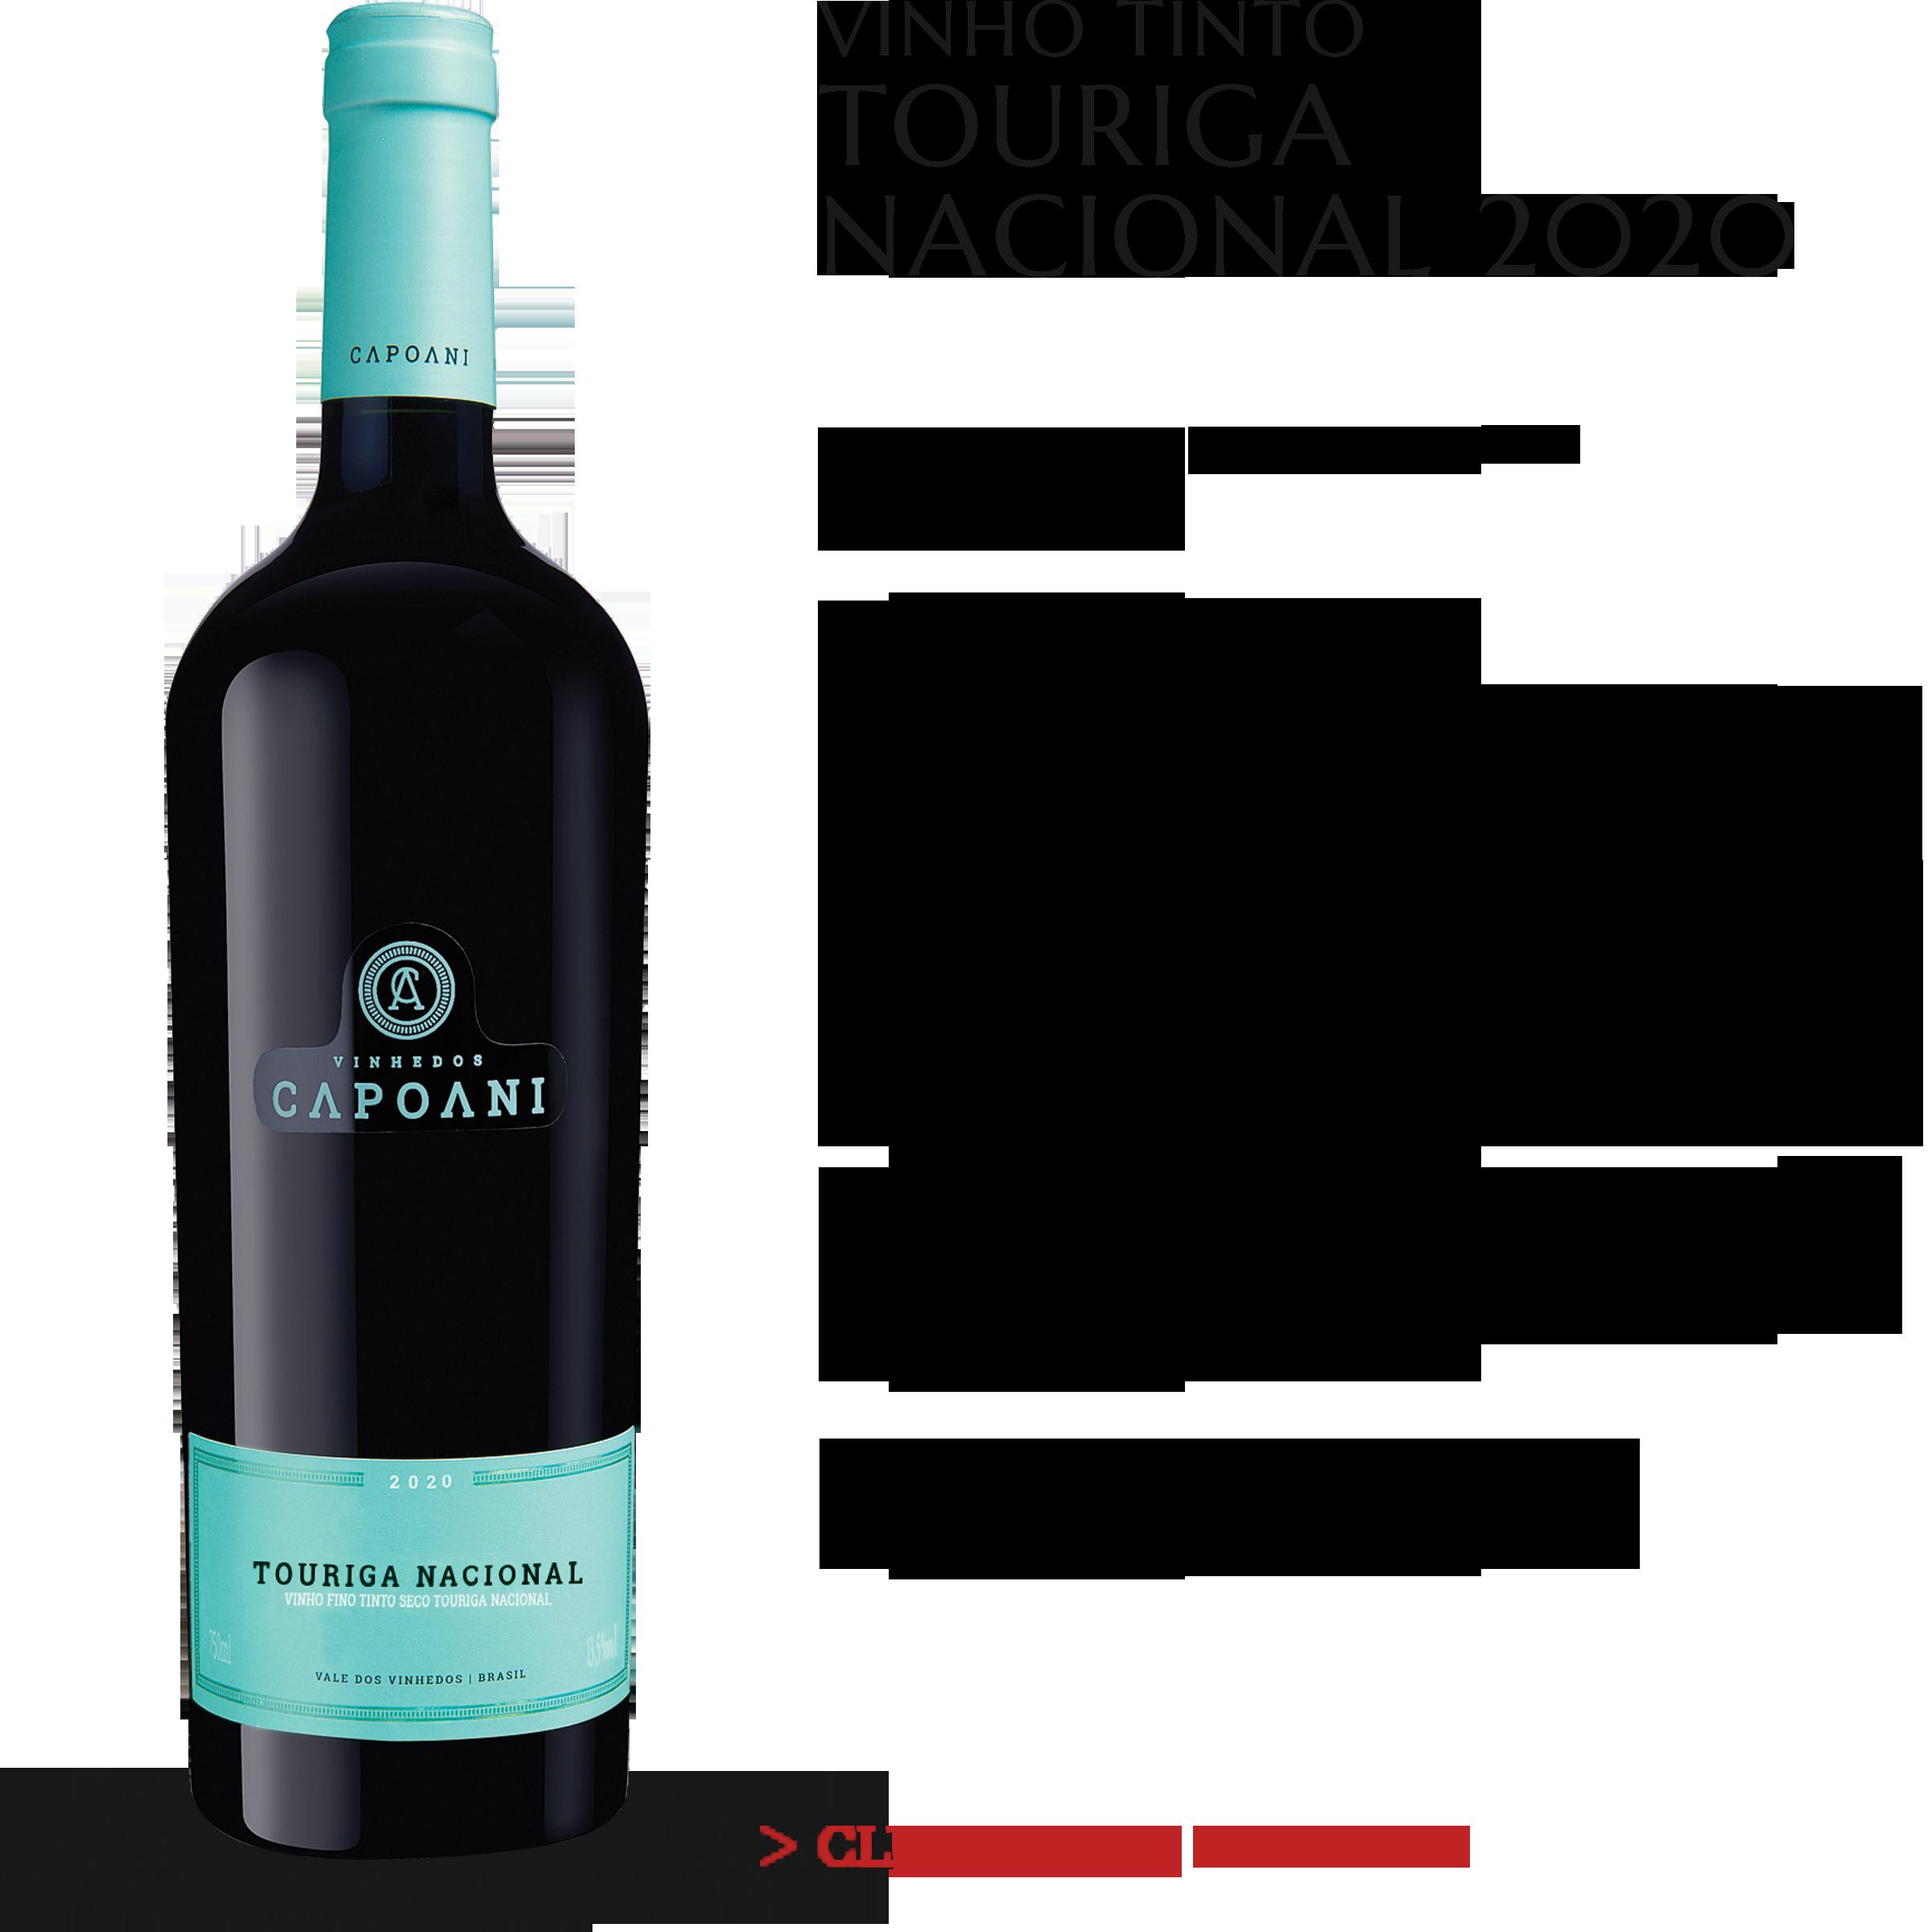 Vinho Tinto Capoani Touriga Nacional 2020